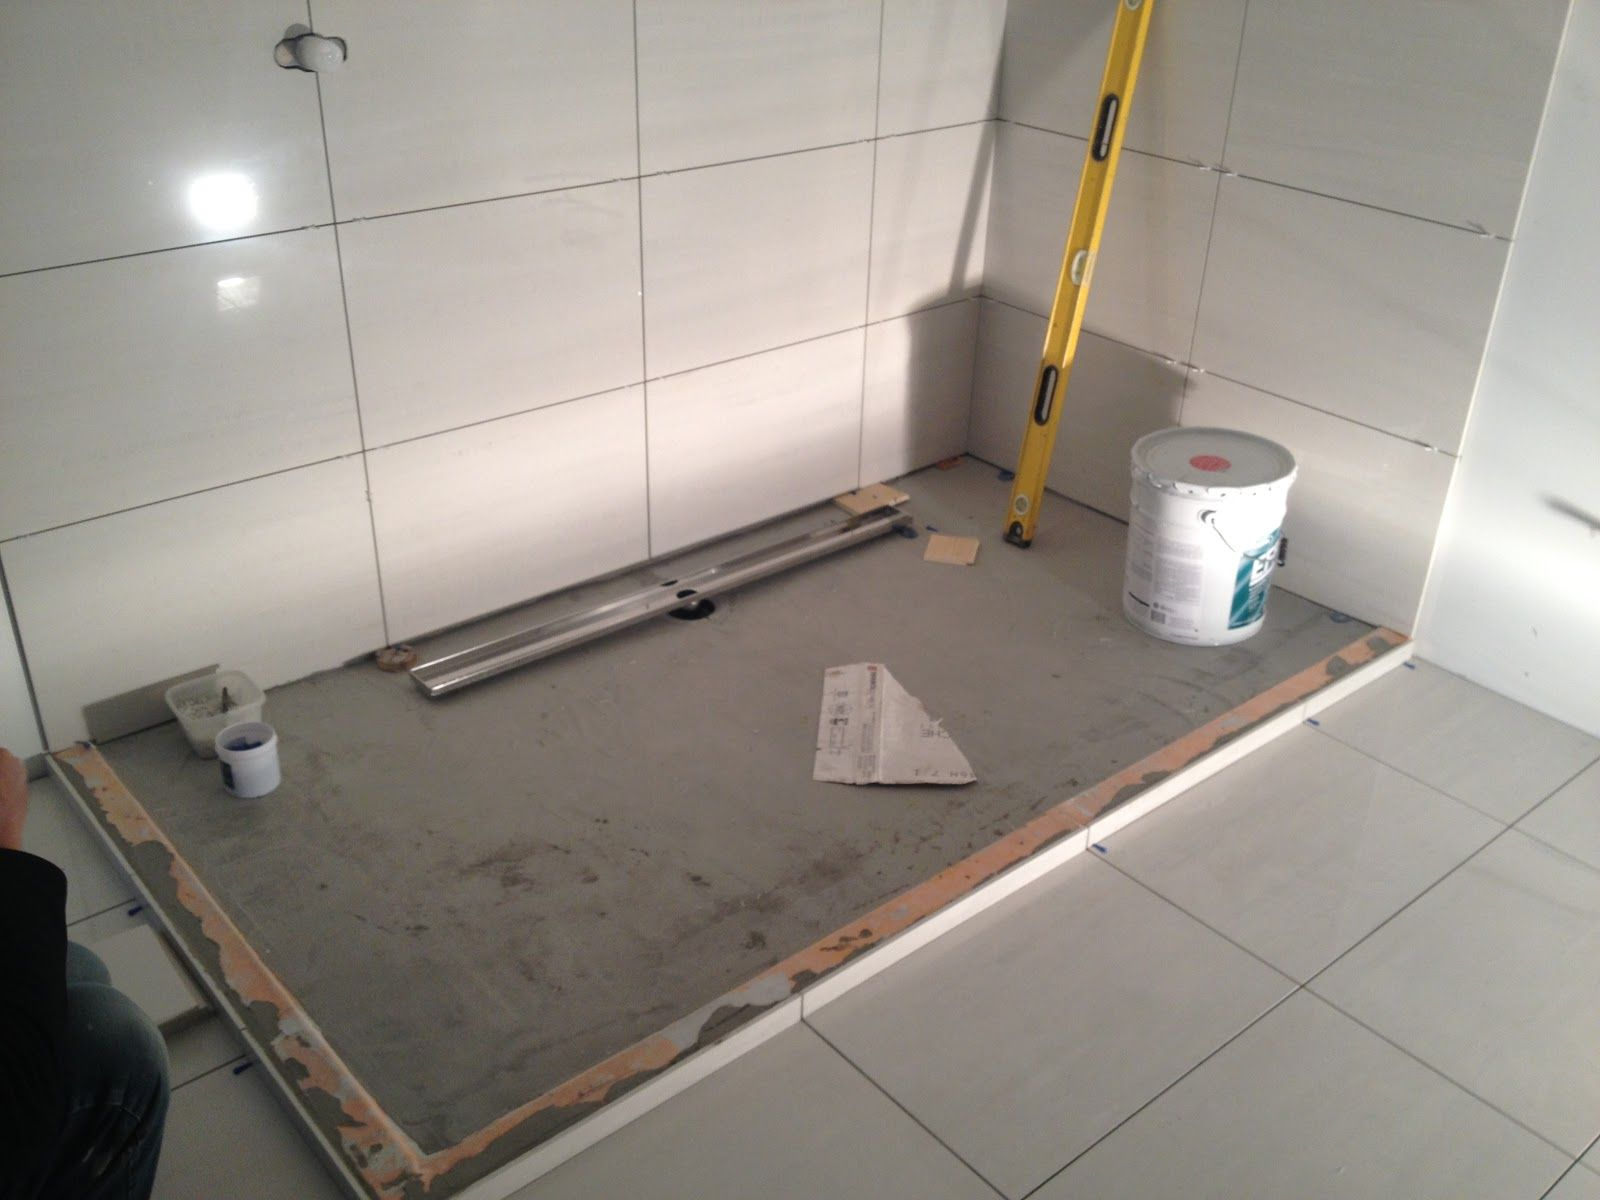 No Curb Bathroom Design Ideas ~ Curb linear shower drains and barrier free